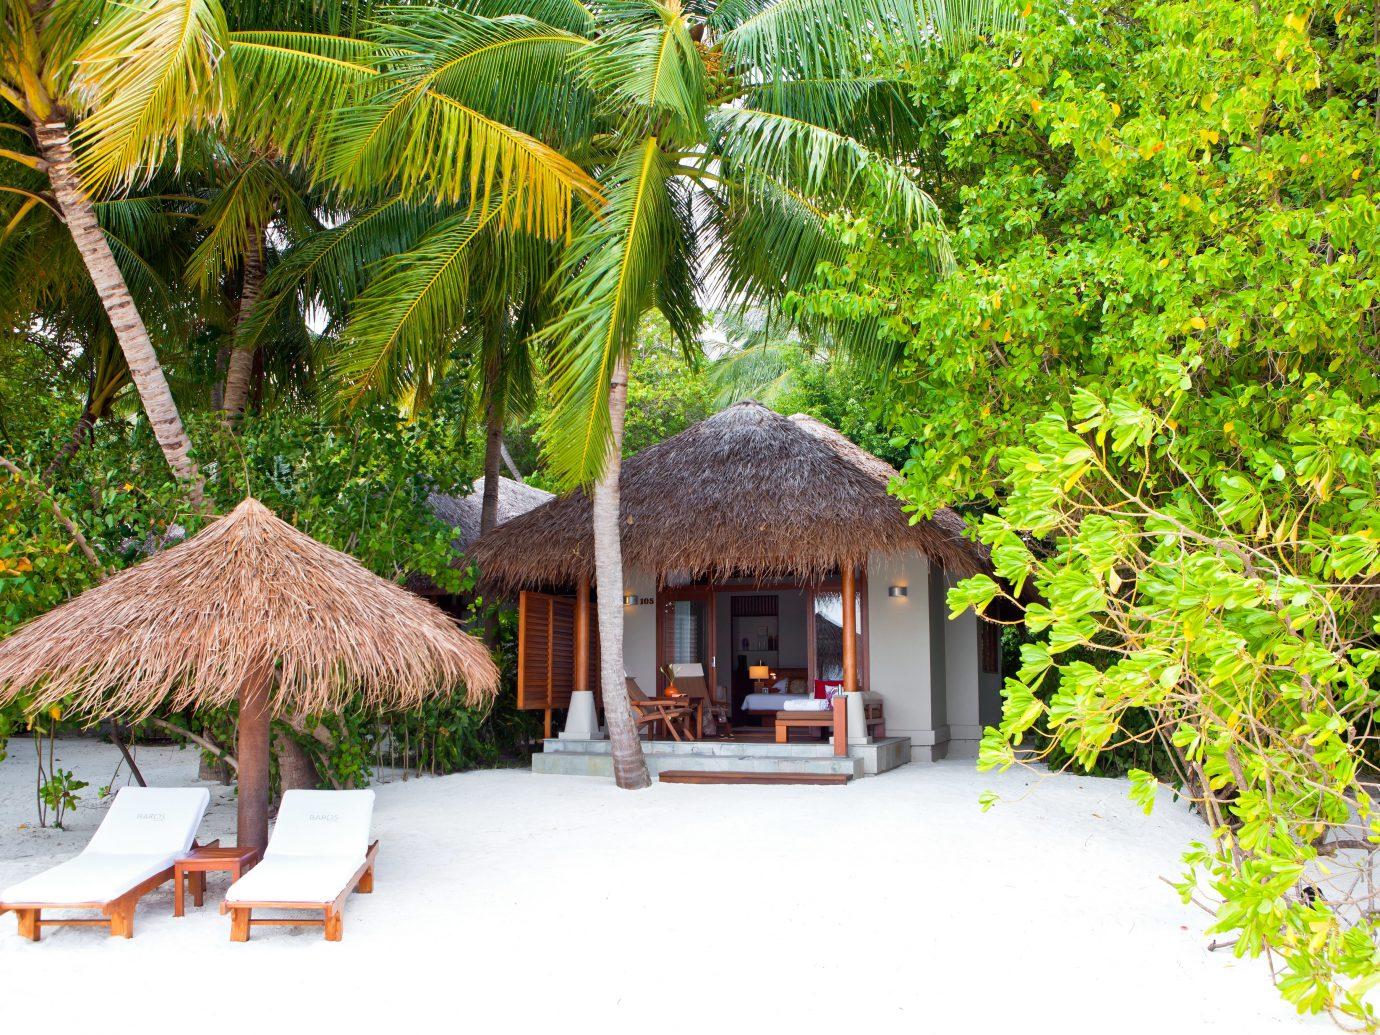 Hotels tree outdoor Resort Jungle hut estate rainforest Village plant